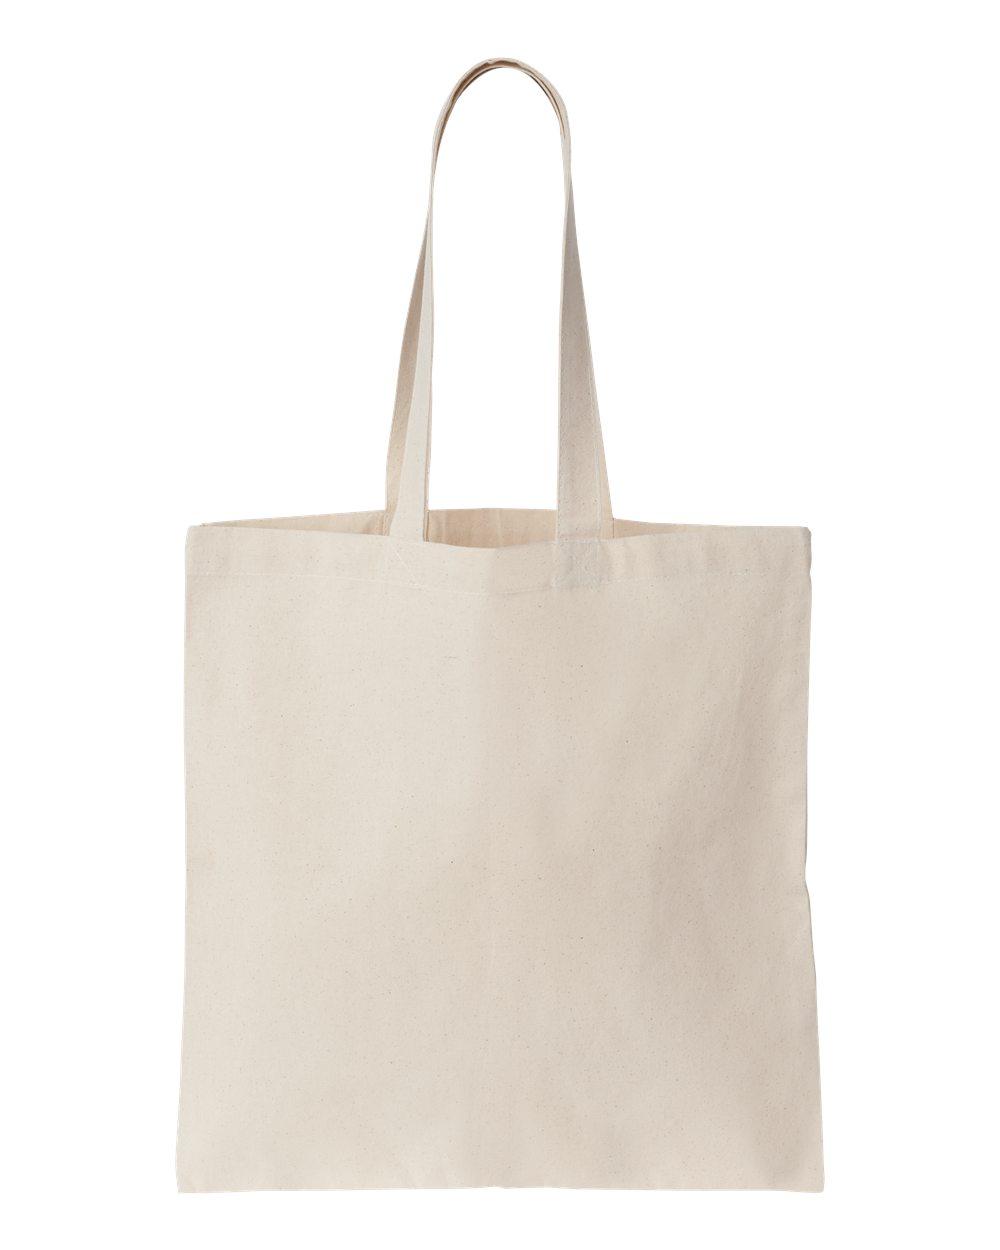 Cloth Bags Bag Adver Drawstring Product On Alibaba